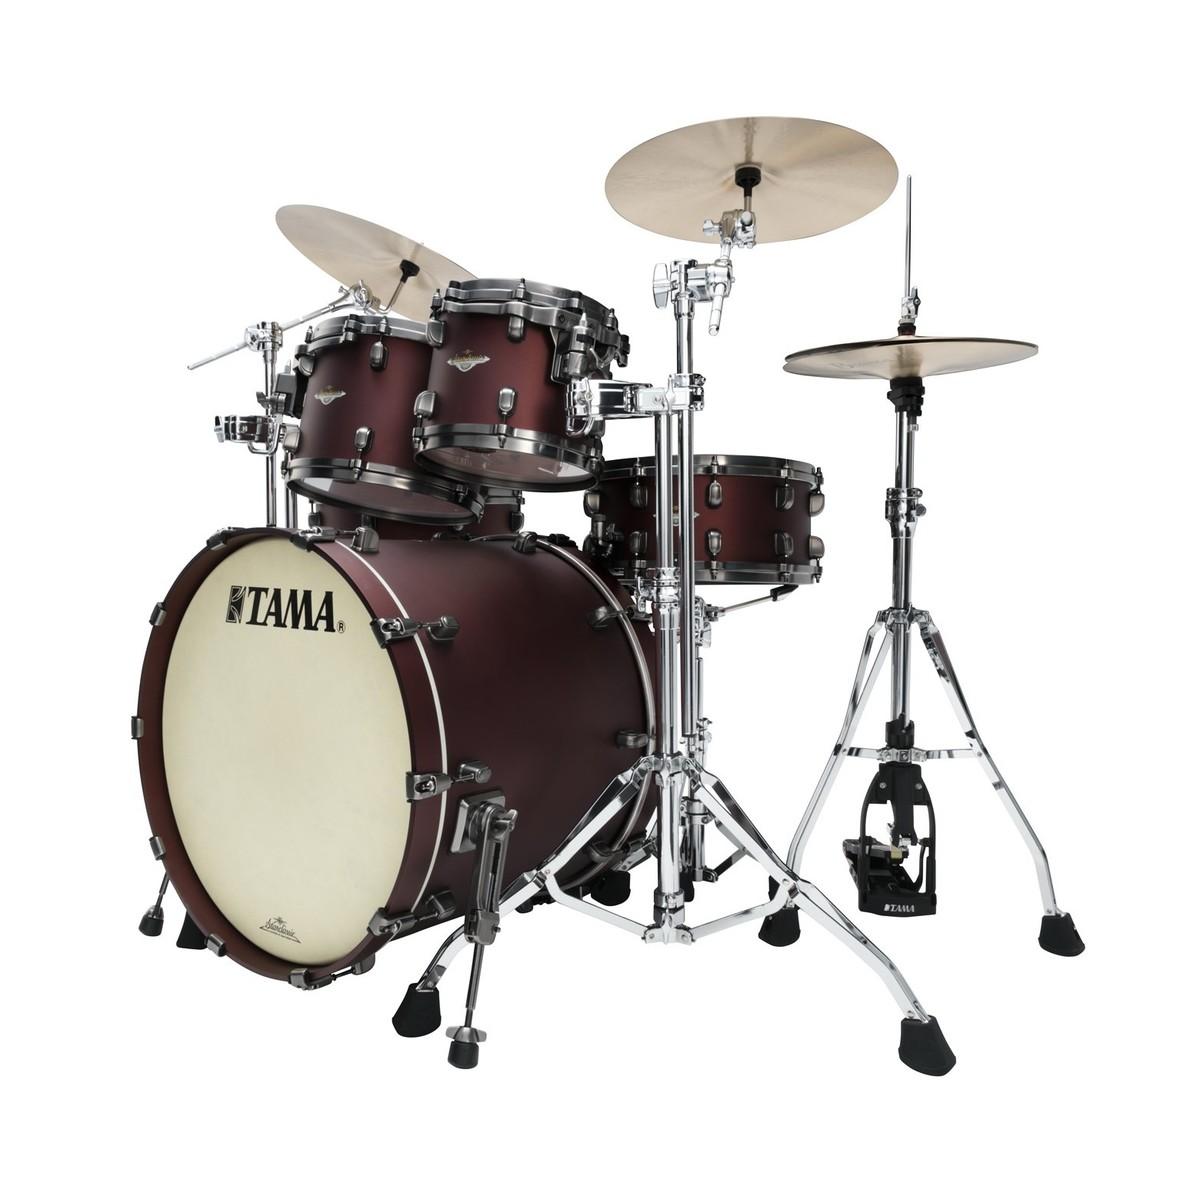 tama starclassic bubinga 22 4pc shell pack flat burgundy metallic at. Black Bedroom Furniture Sets. Home Design Ideas